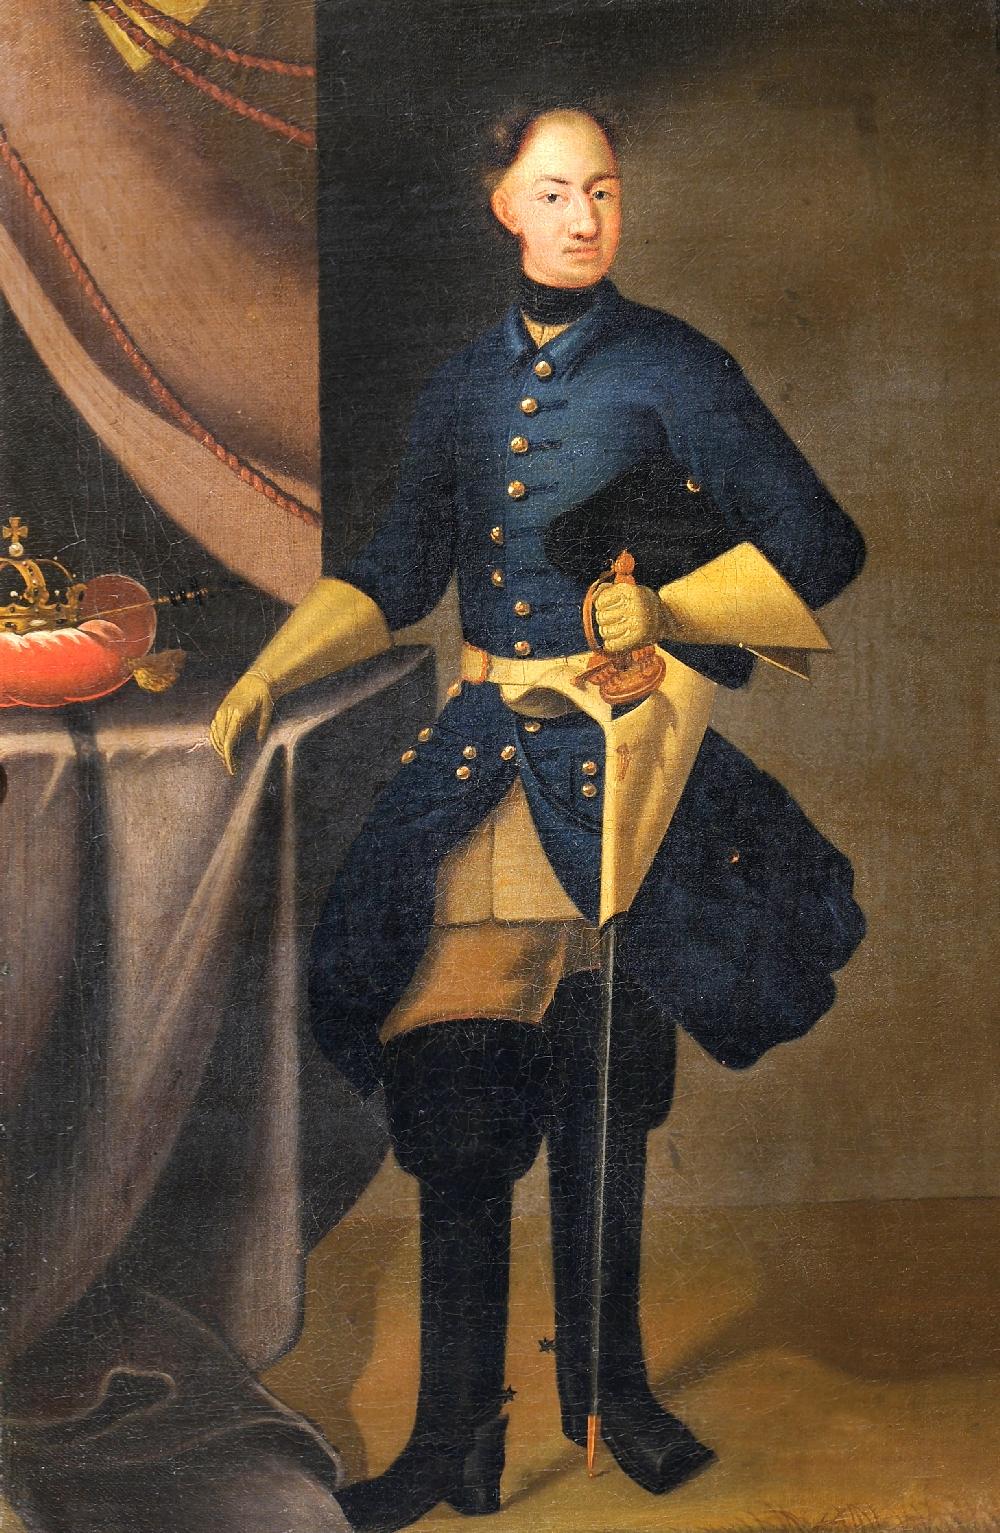 File:Charles XII of Sweden by David von Krafft (after).jpg